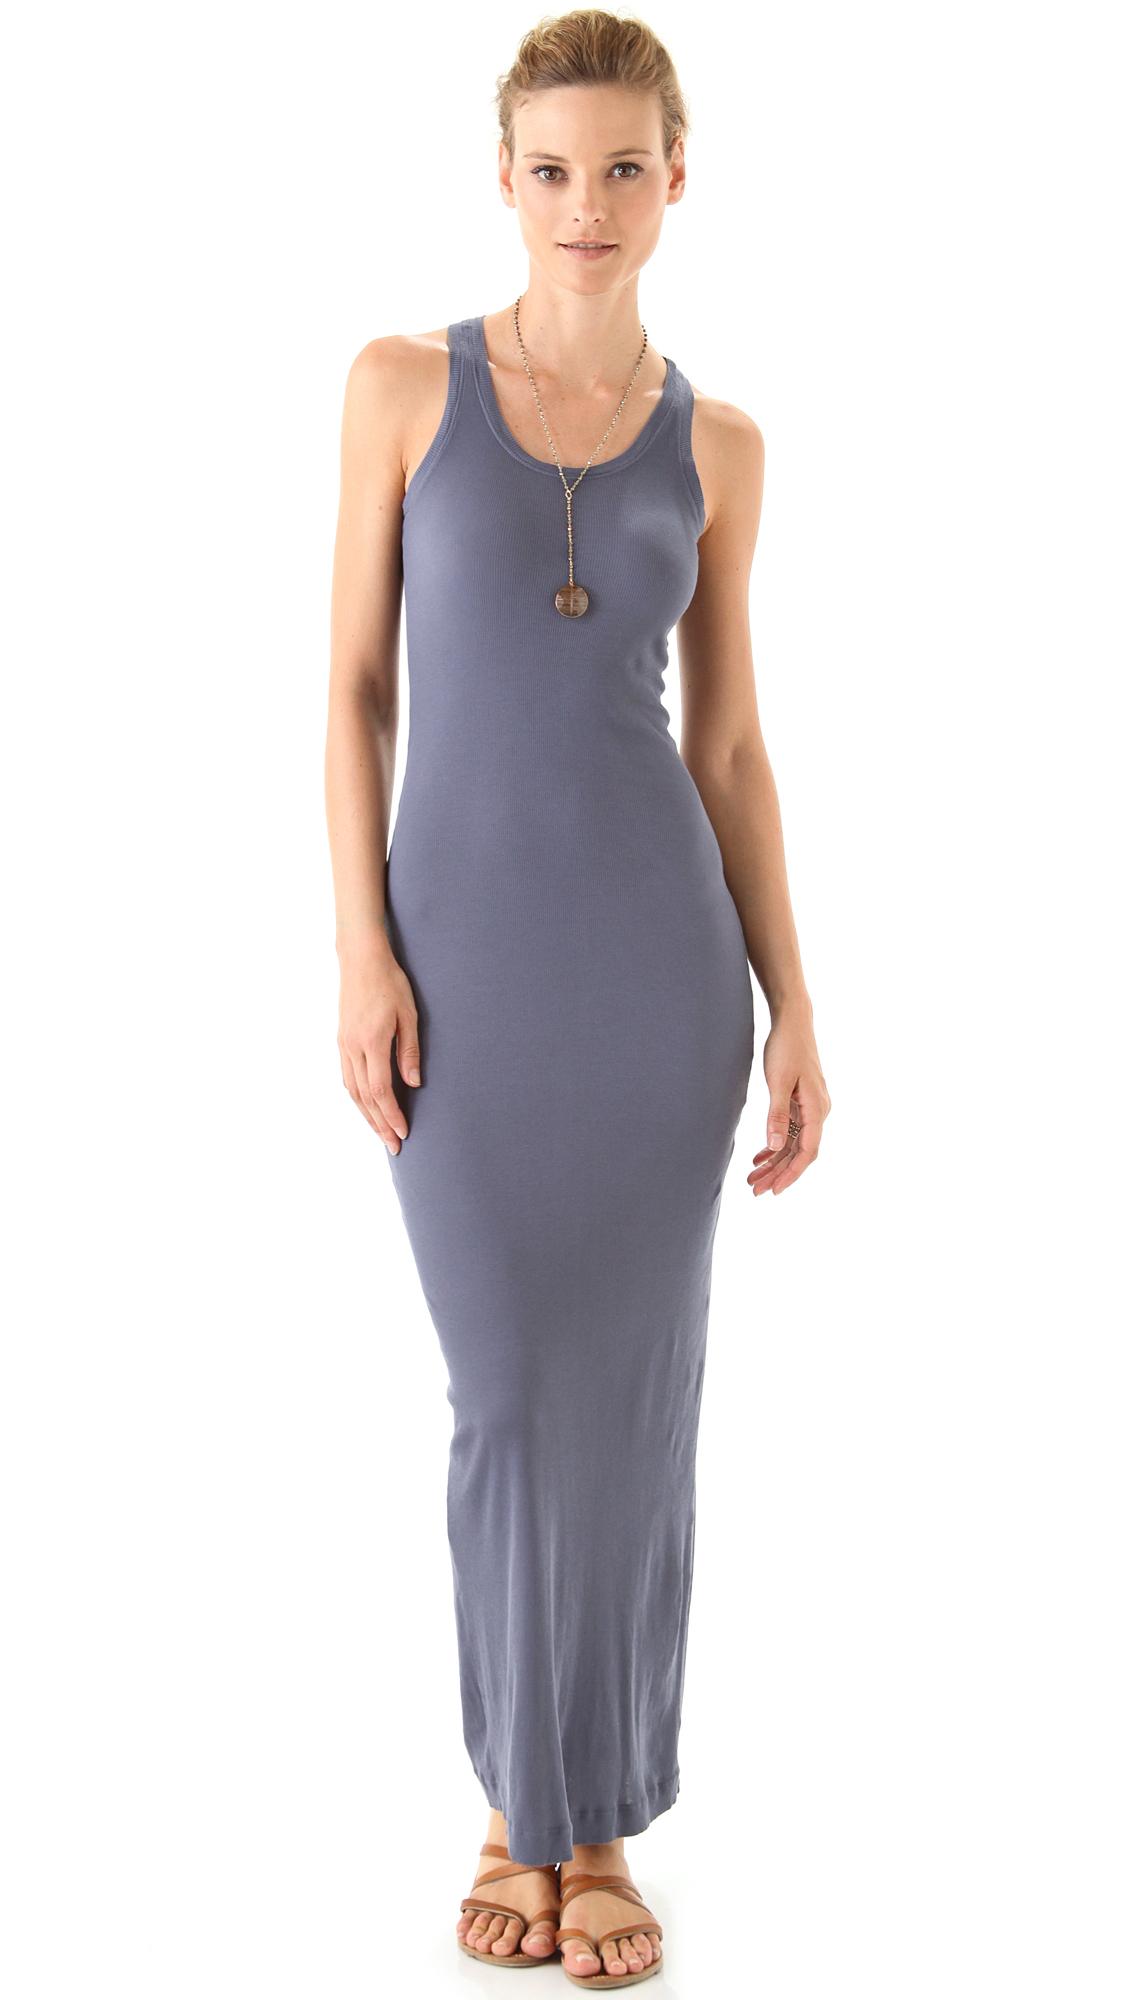 splendid u neck maxi dress in petite